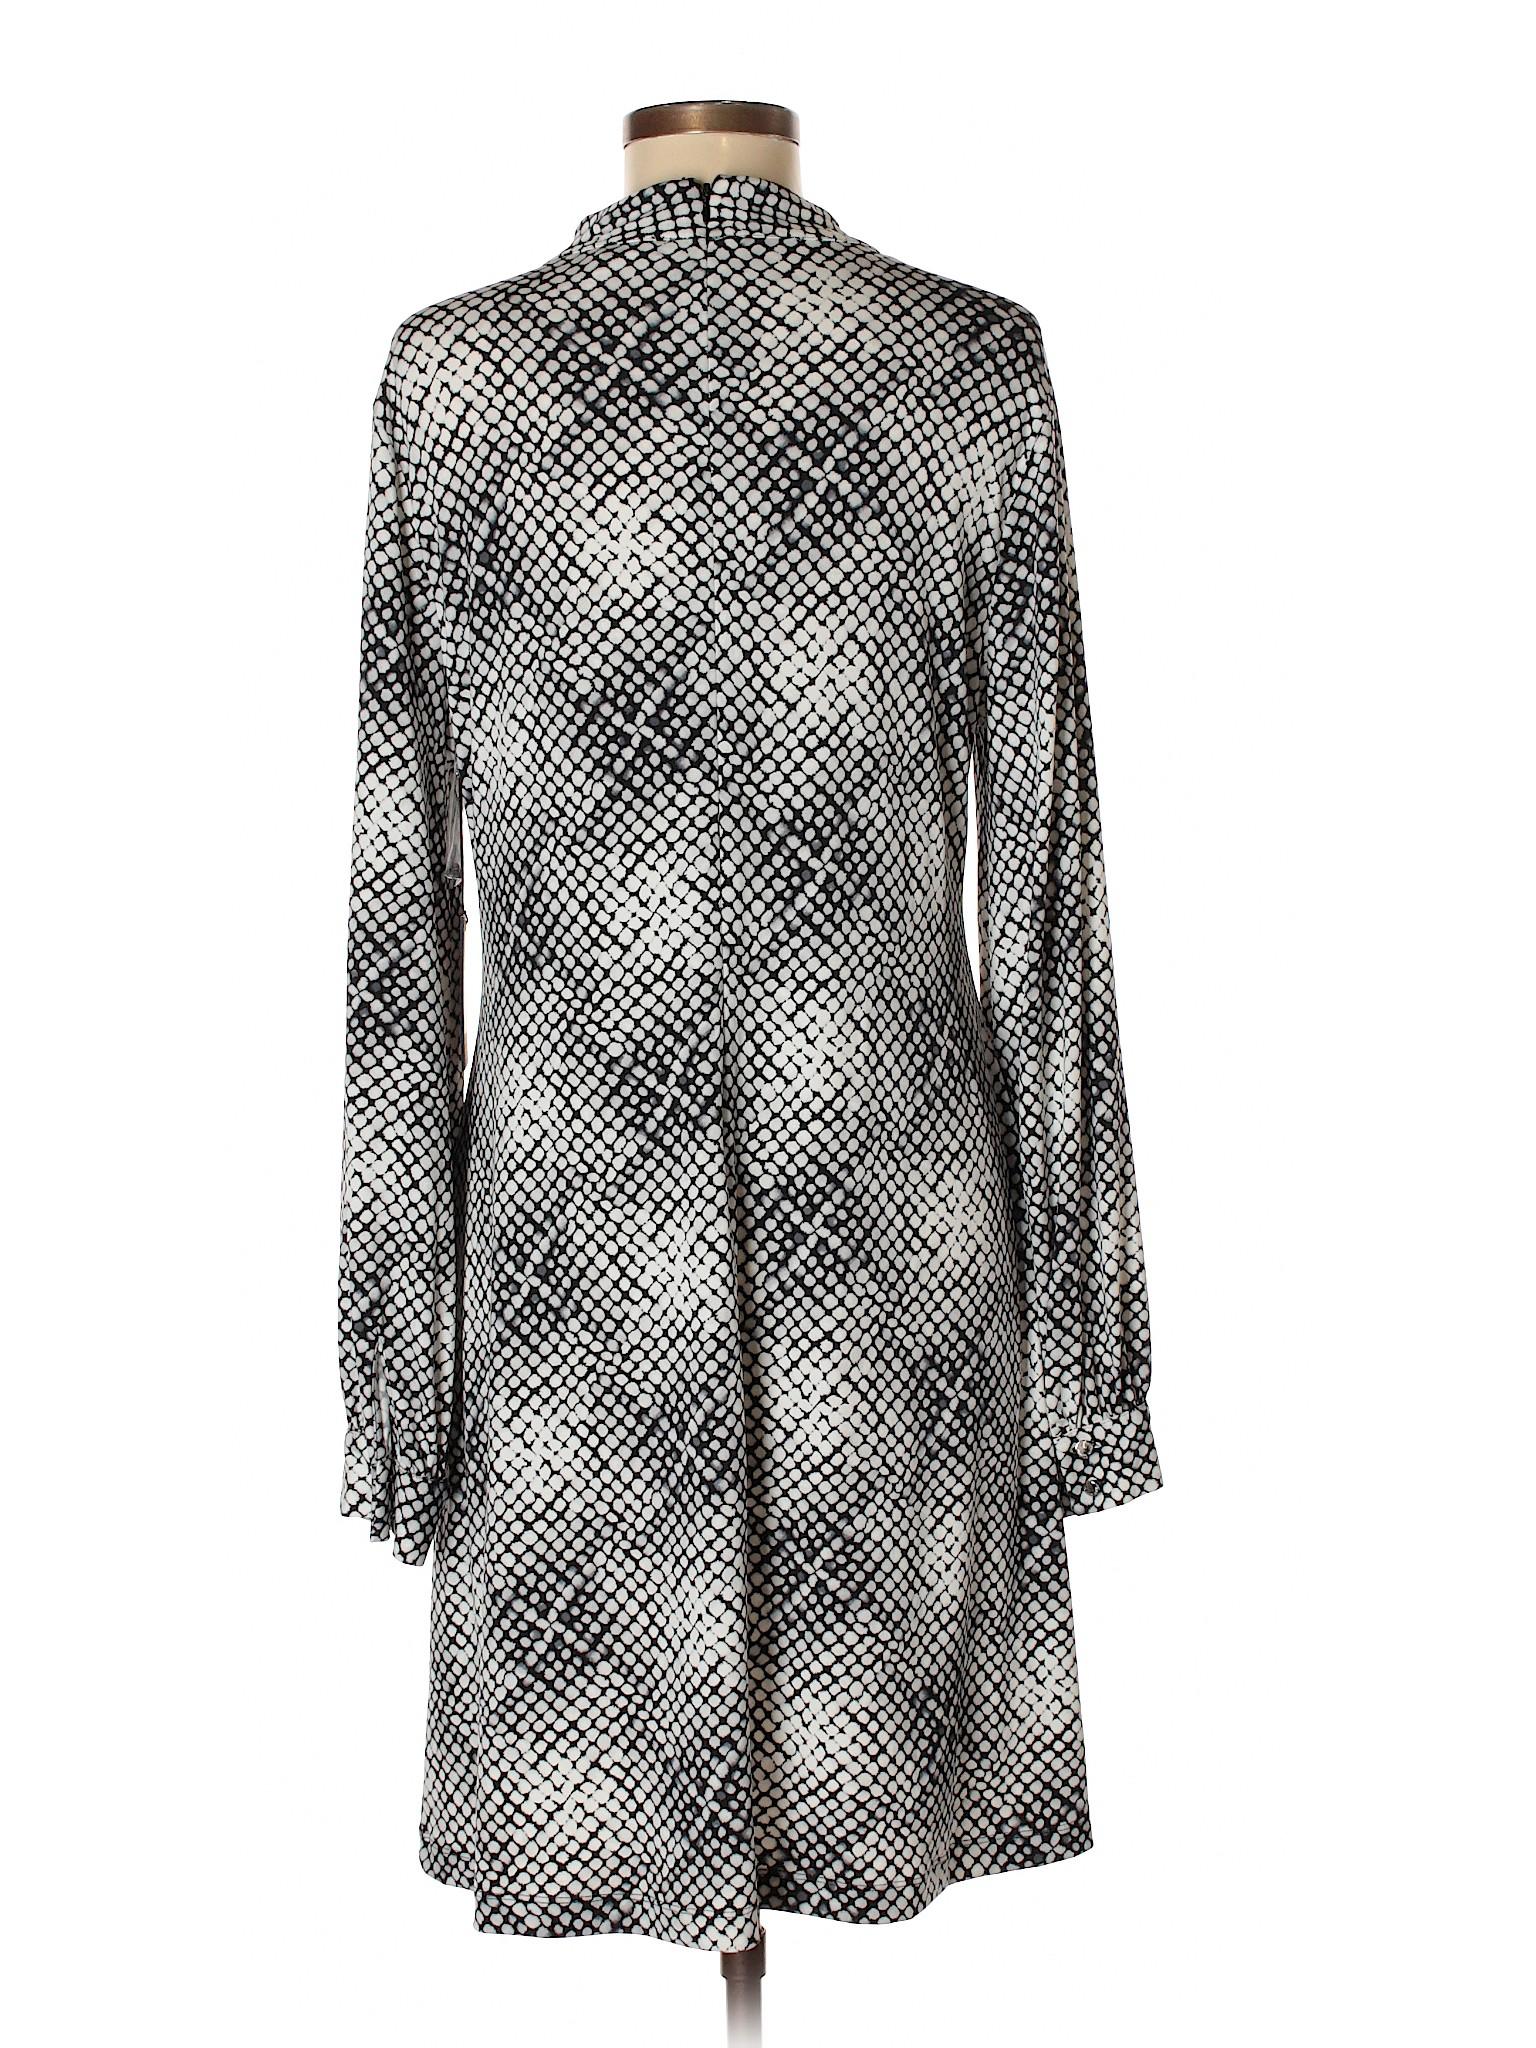 Camuto Vince Boutique Winter Dress Casual BSxXxEPq